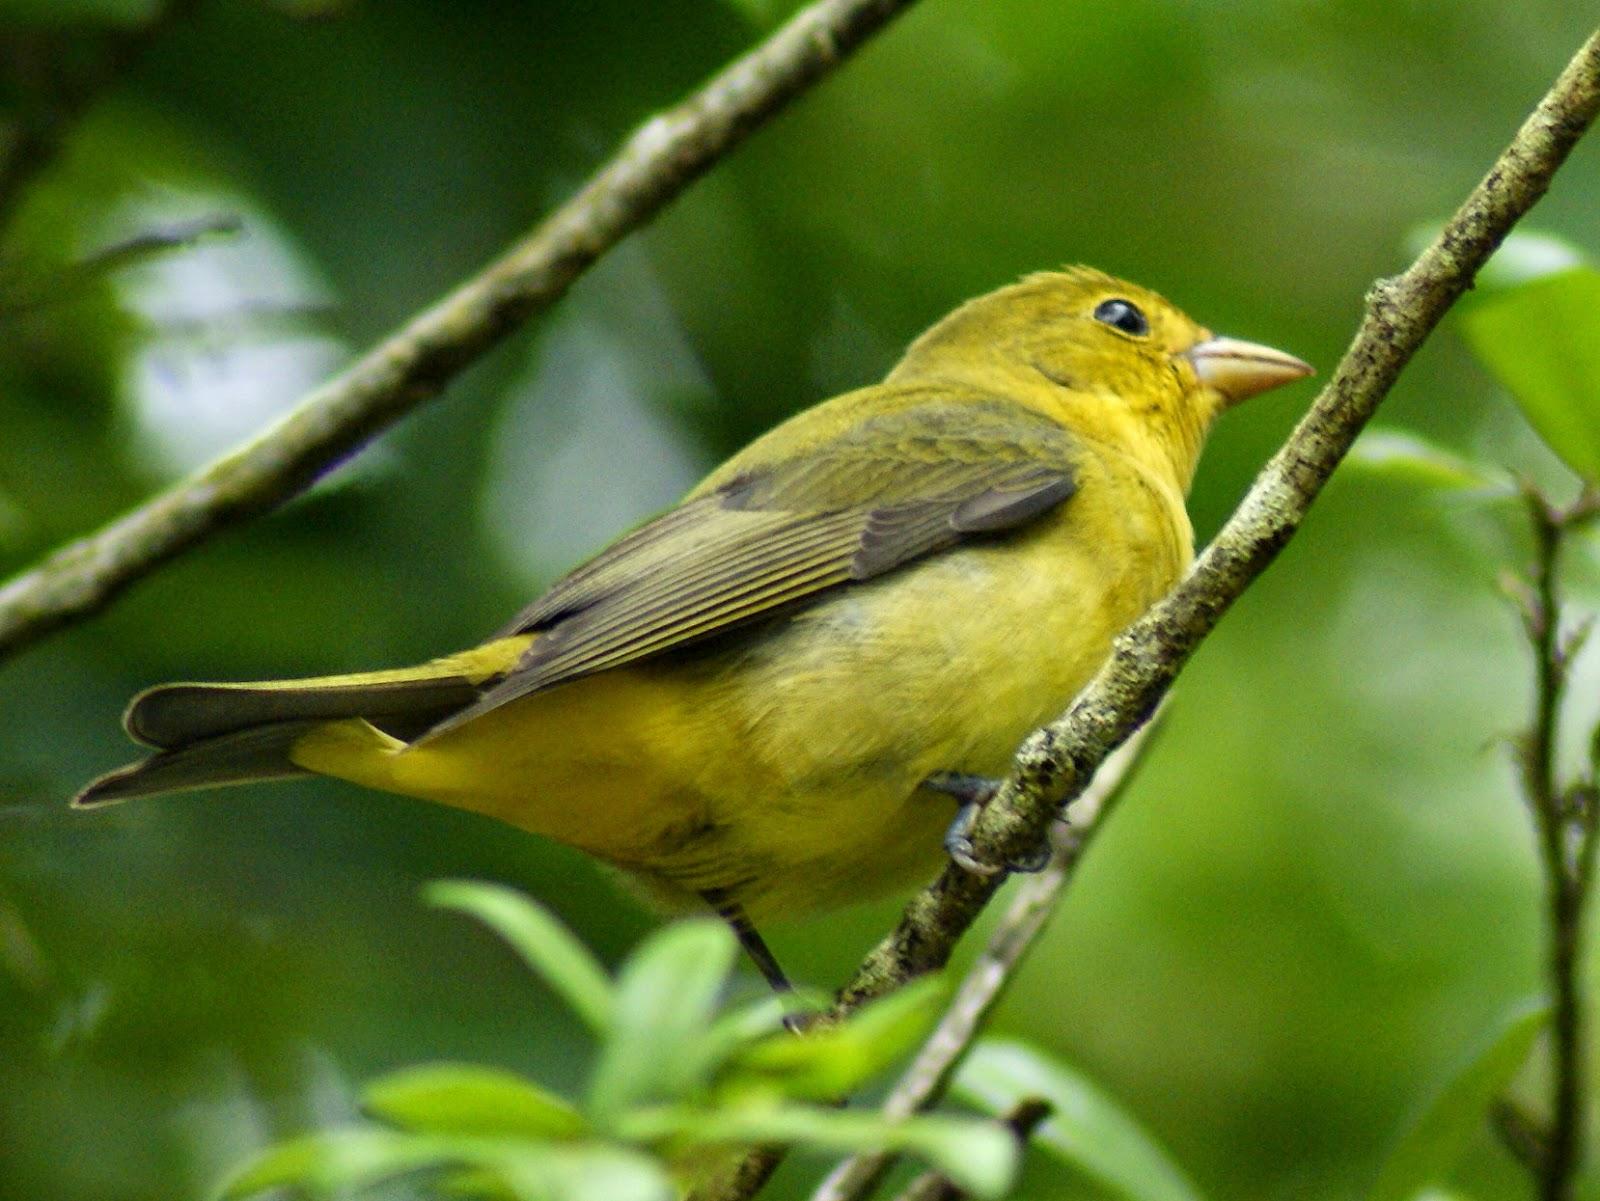 texas bird Green breasted